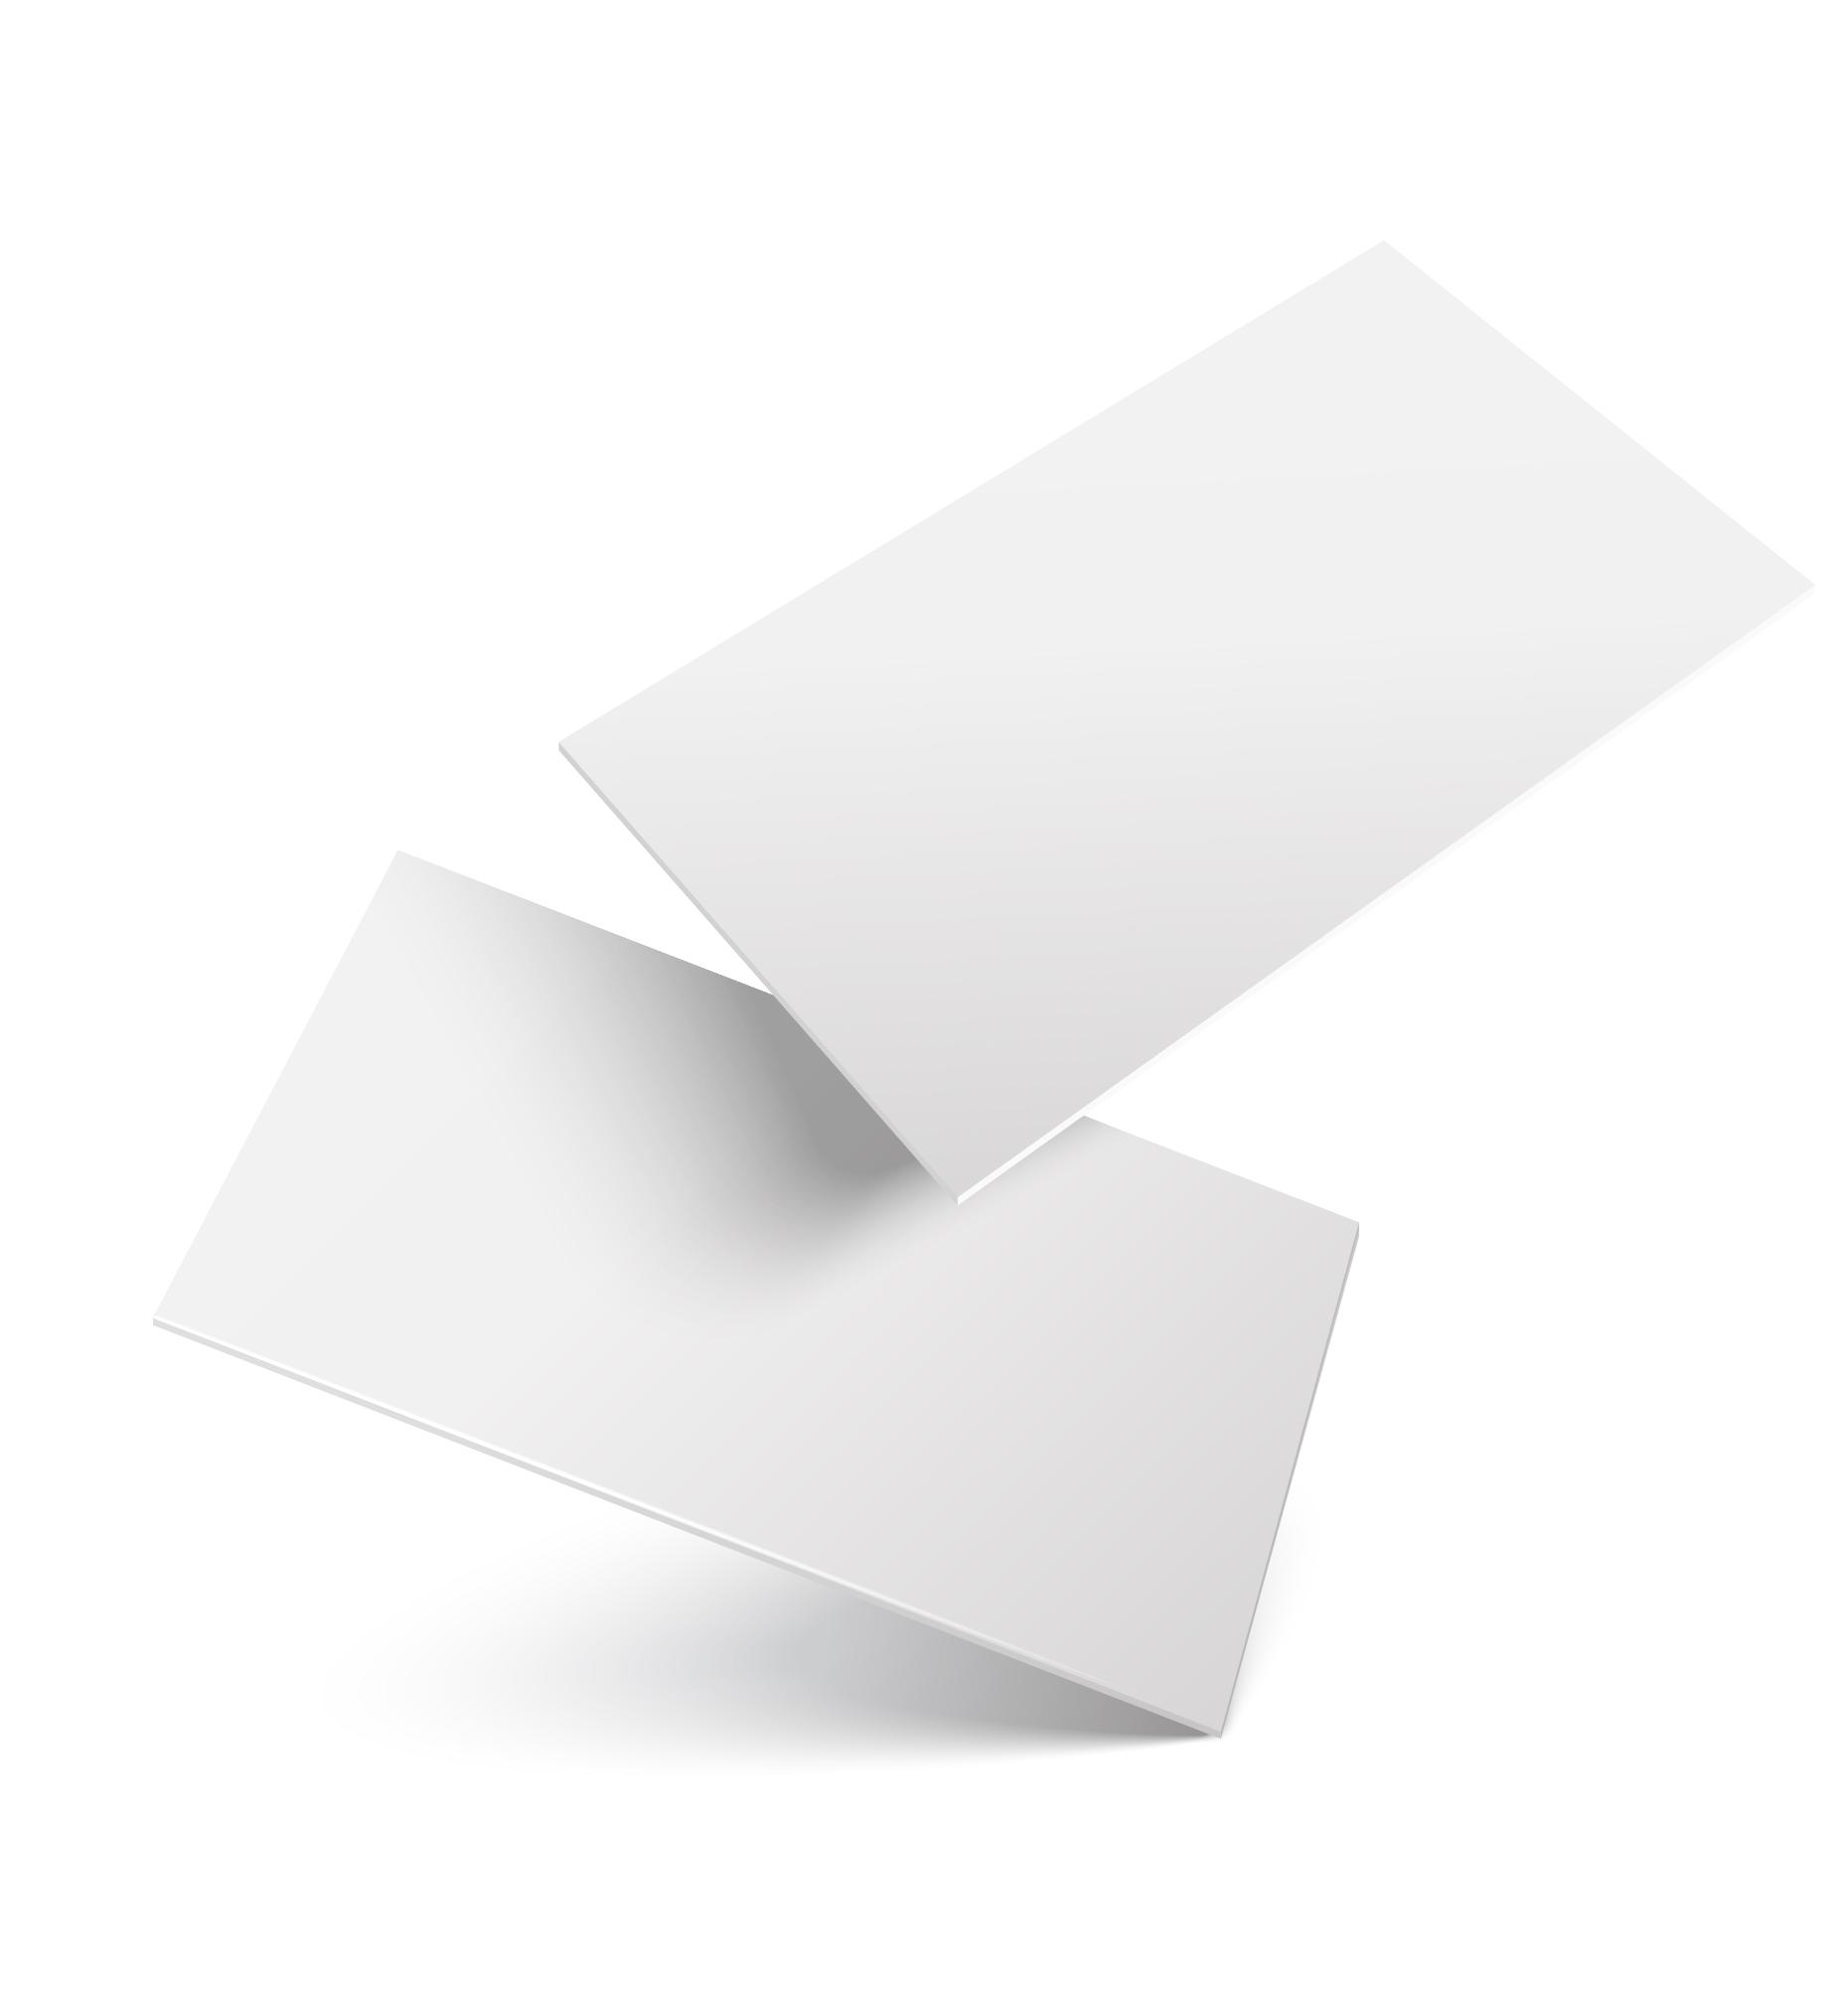 Mantell   Branding   Corporate Identity   Logo   Stationery